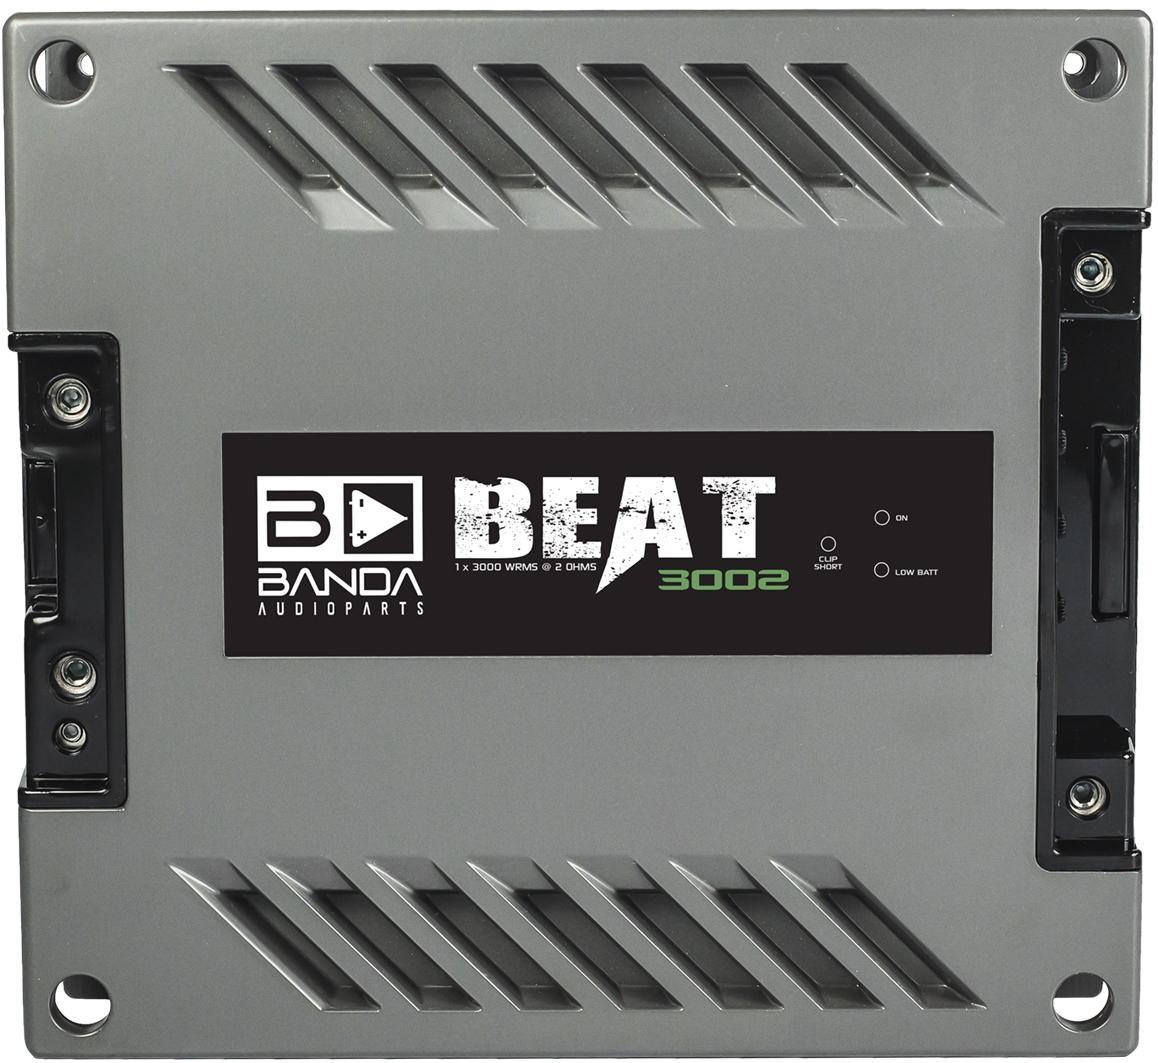 beat-3002-frente-19-2 BEAT 3002